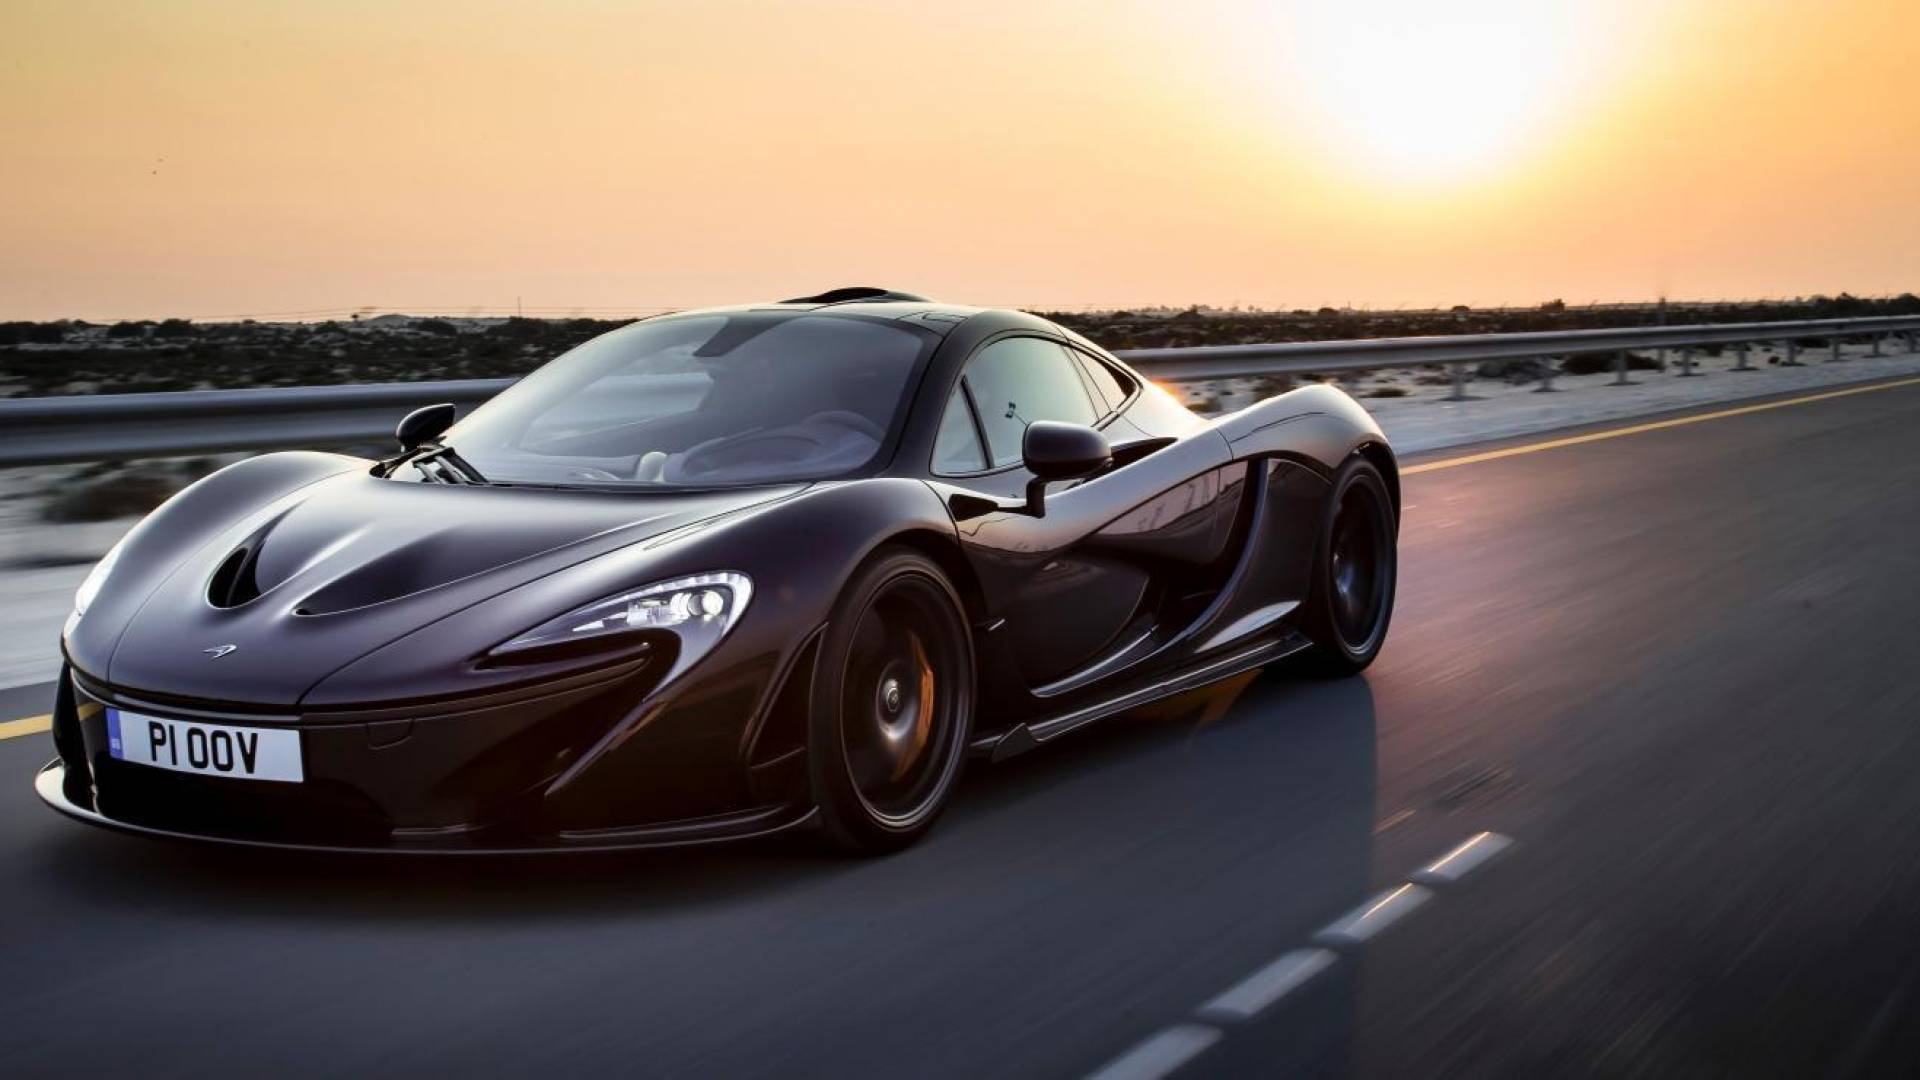 McLaren-P1-Bahrain-773-crop5184x2670_1920x1600c